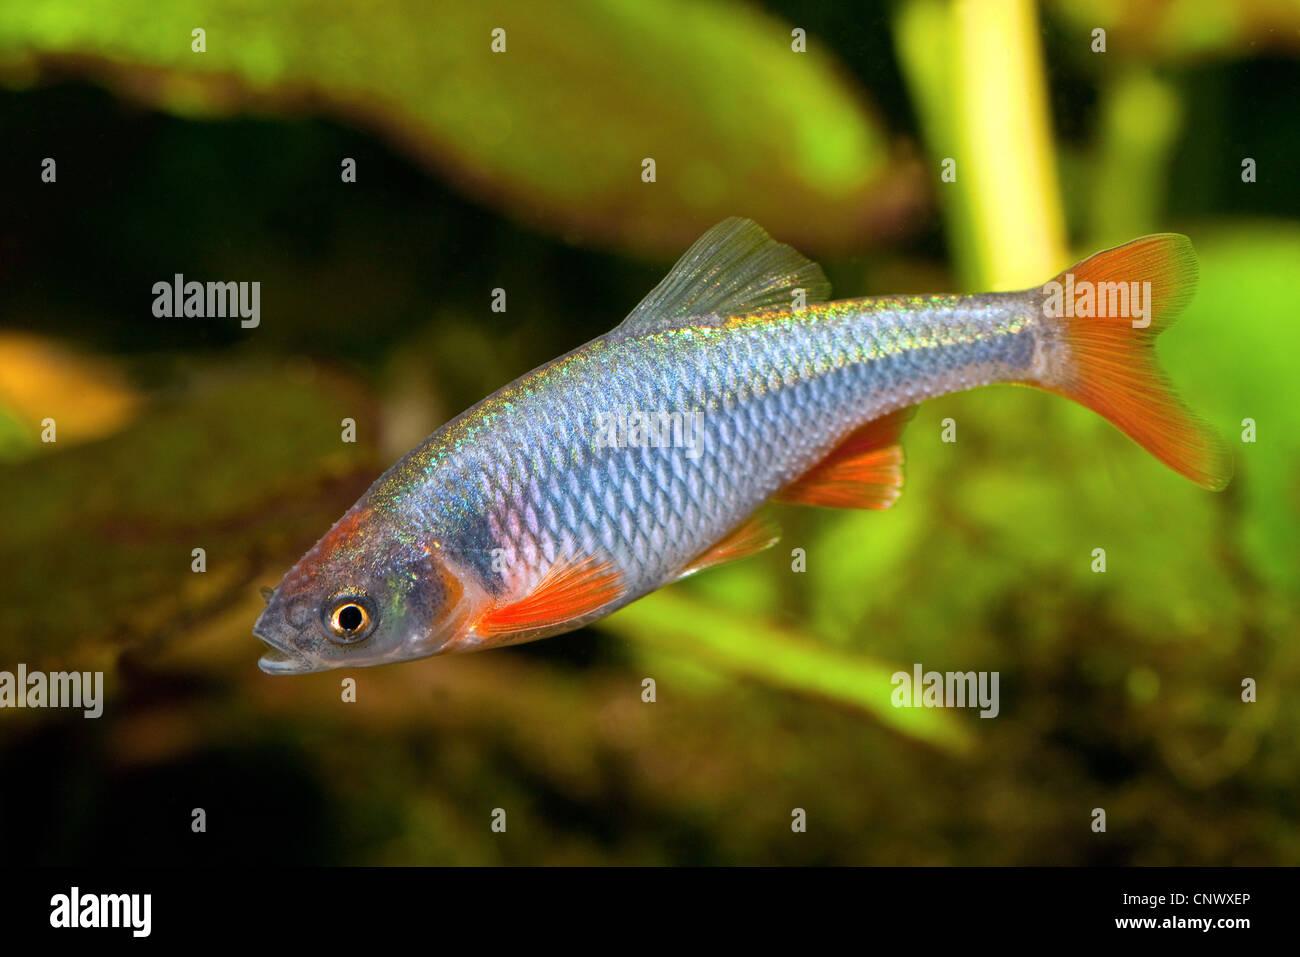 red shiner (Notropis lutrensis), male in spawning season - Stock Image